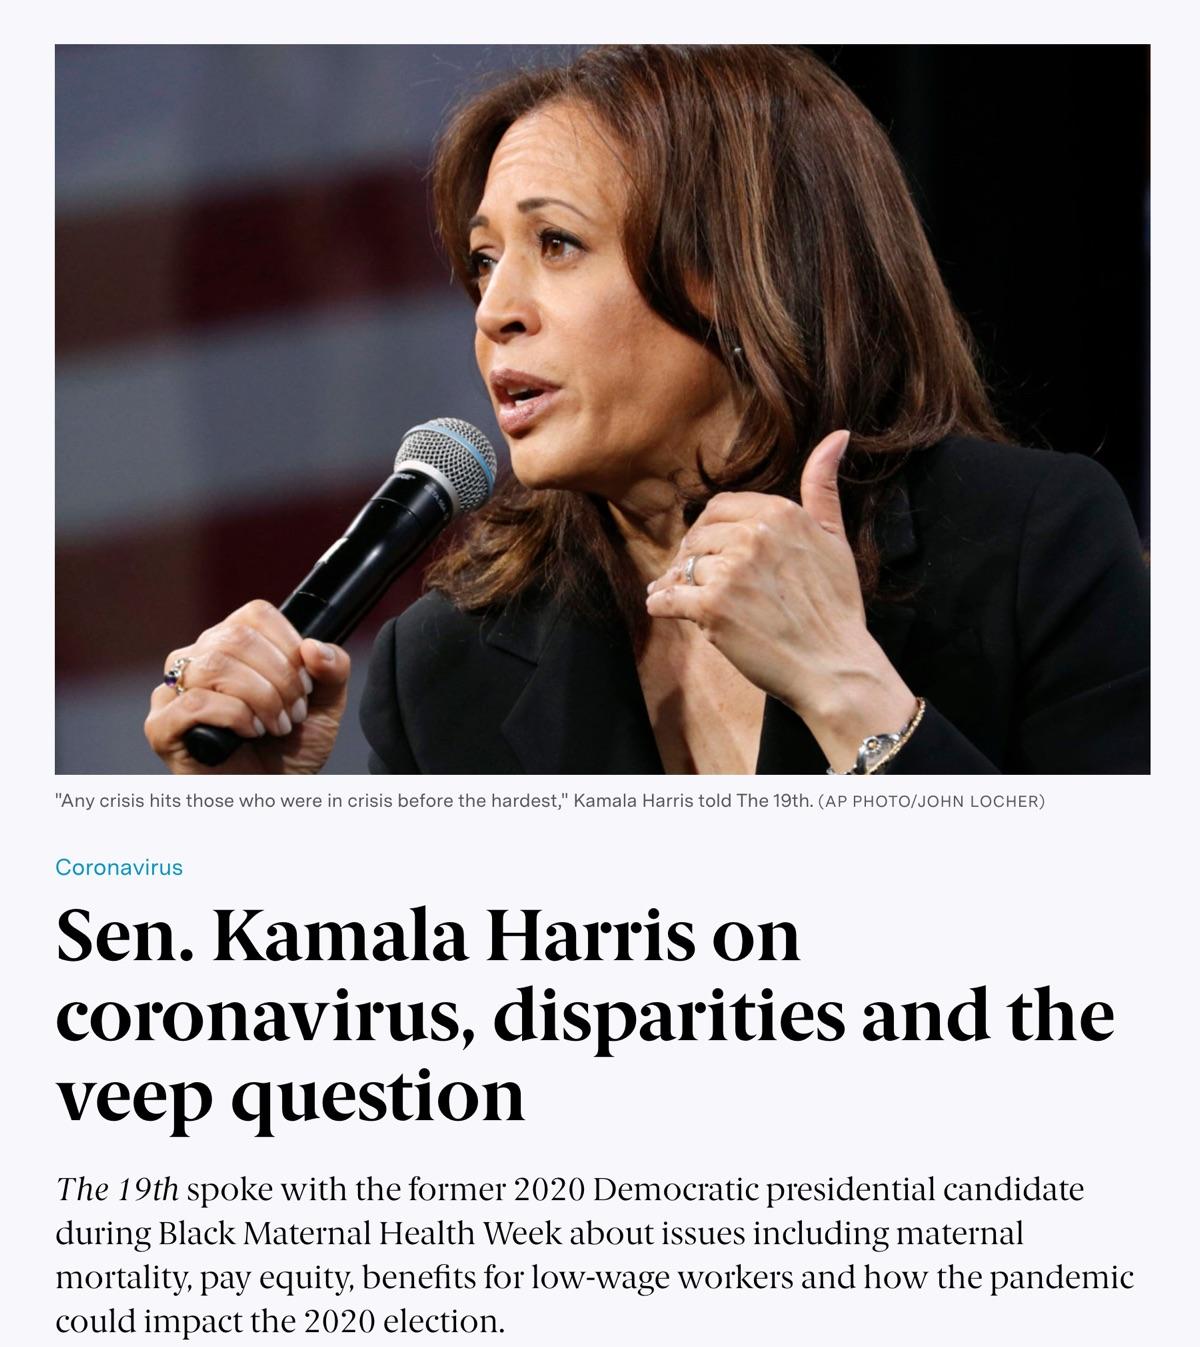 Article: Sen. Kamala Harris on coronavirus disparities and the veep question